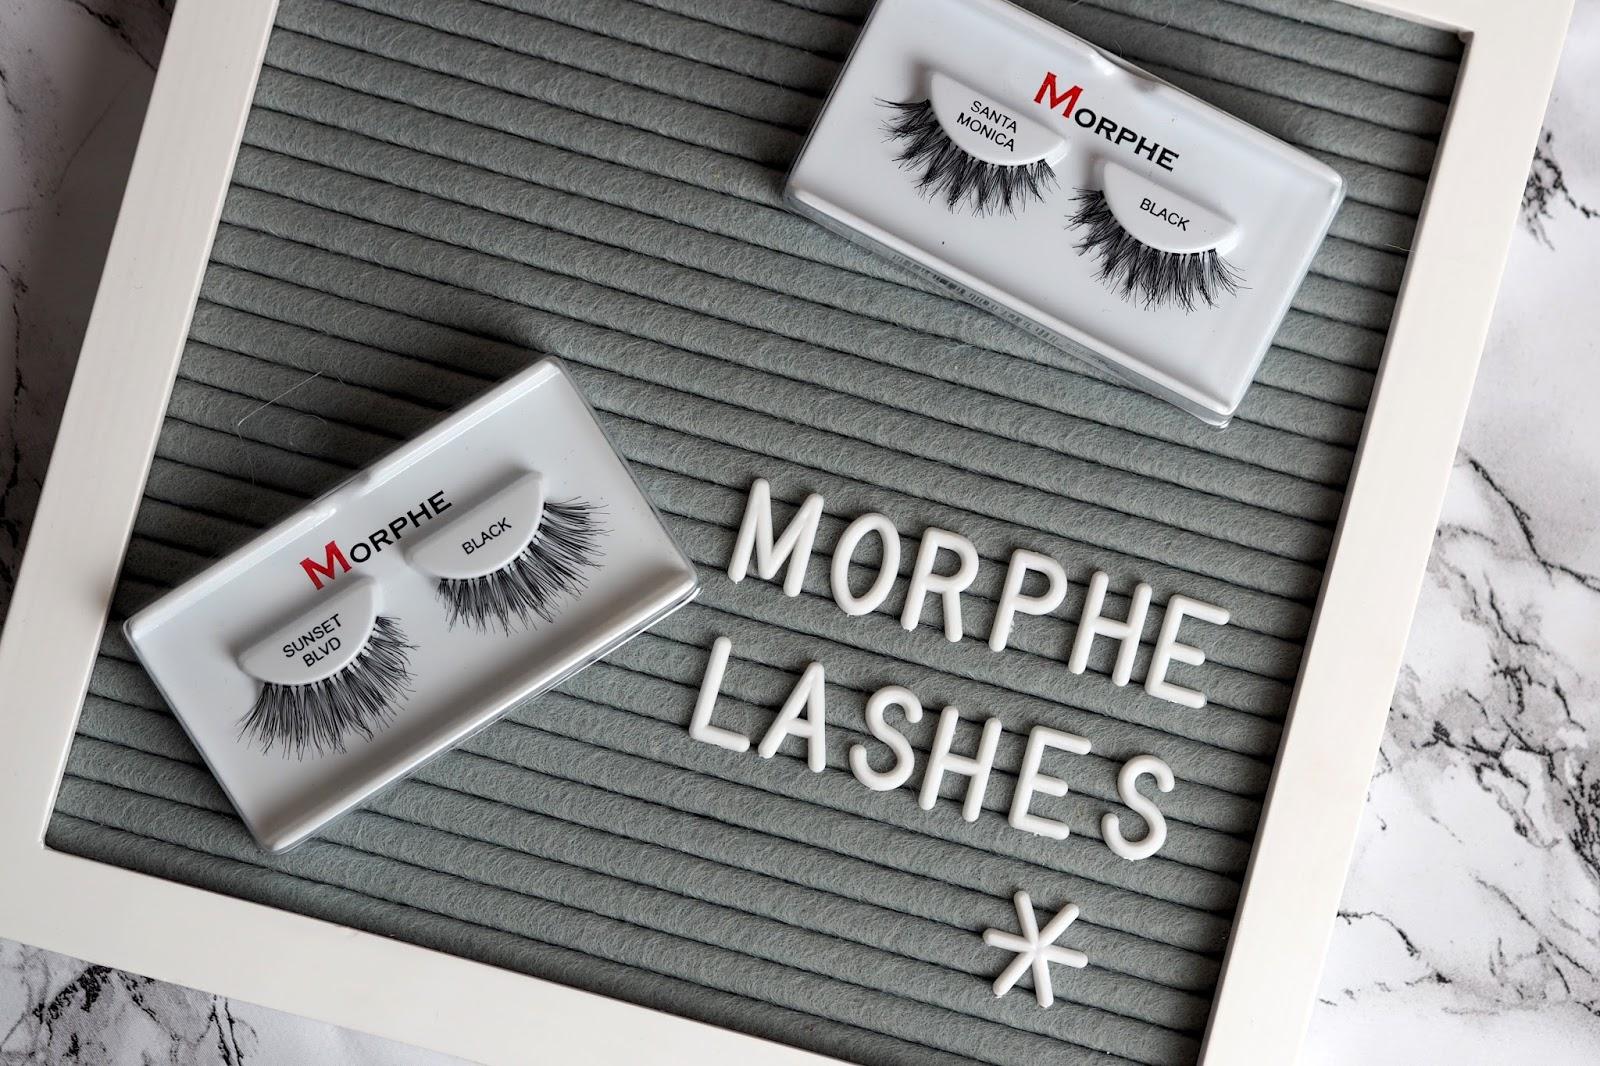 b4bc27d512a Morphe False Eyelashes Review | Not Your Average | Bloglovin'